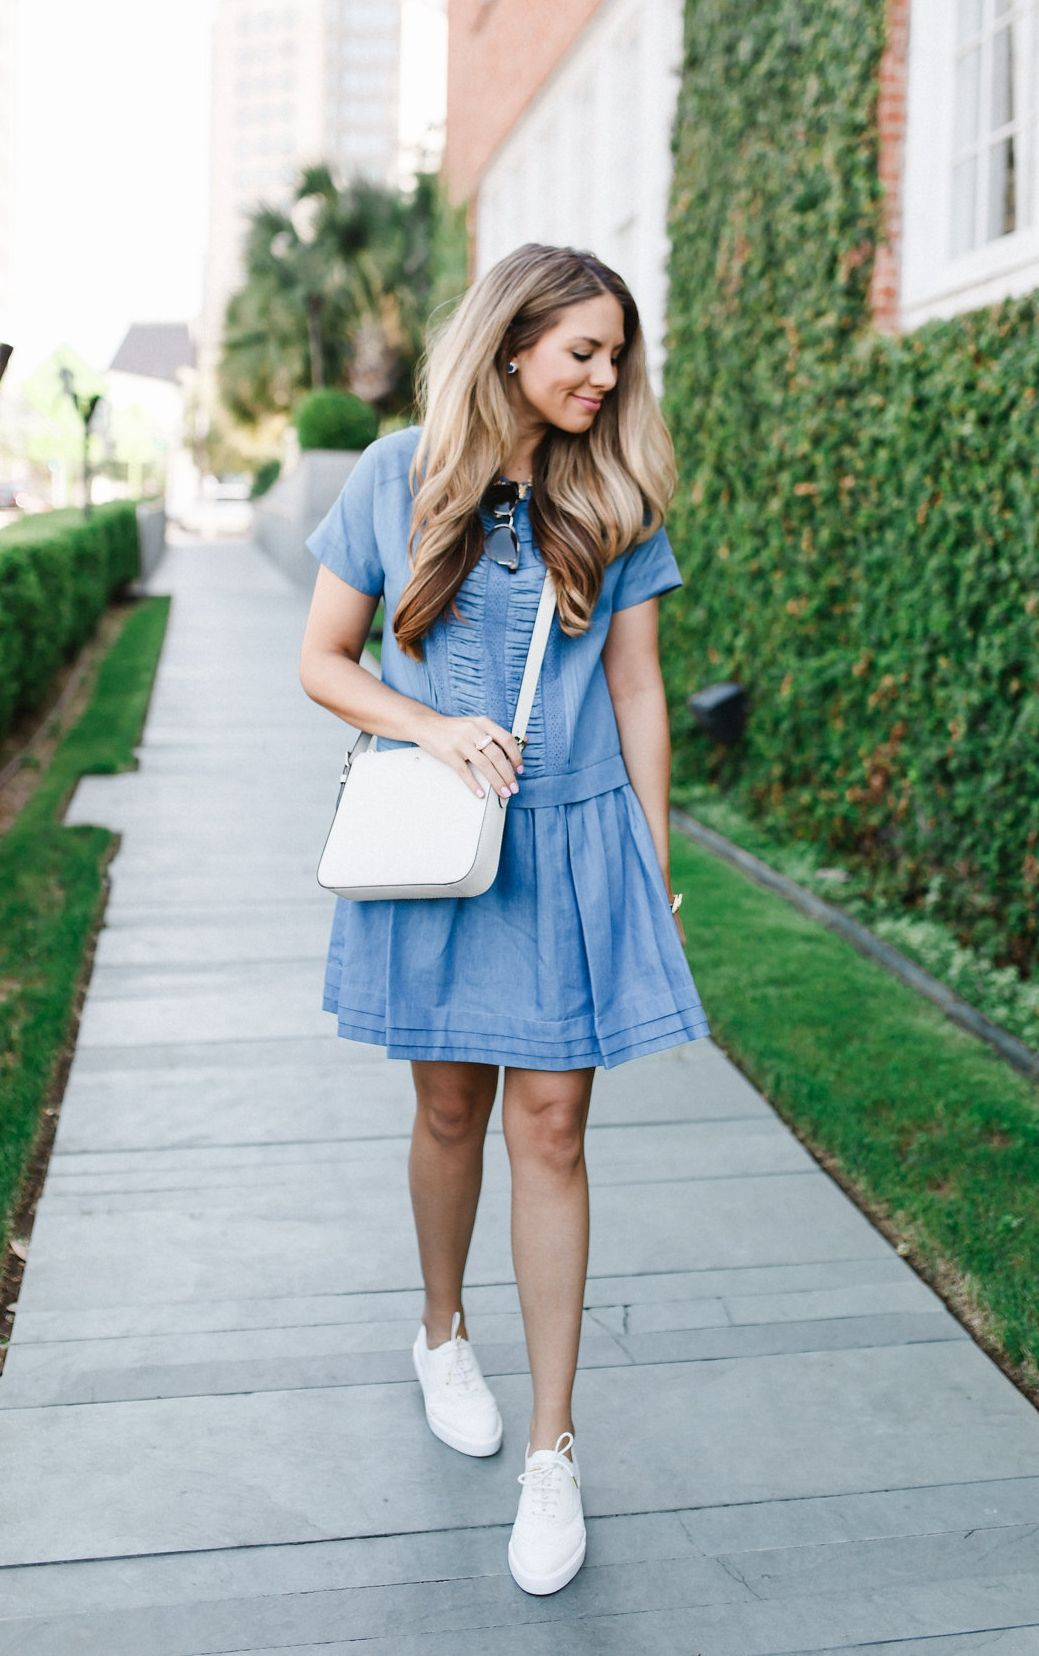 3c1cd0387ff3 Ashley Robertson of The Teacher Diva in her favorite summer combo! kate  spade new york denim dress and sneakers